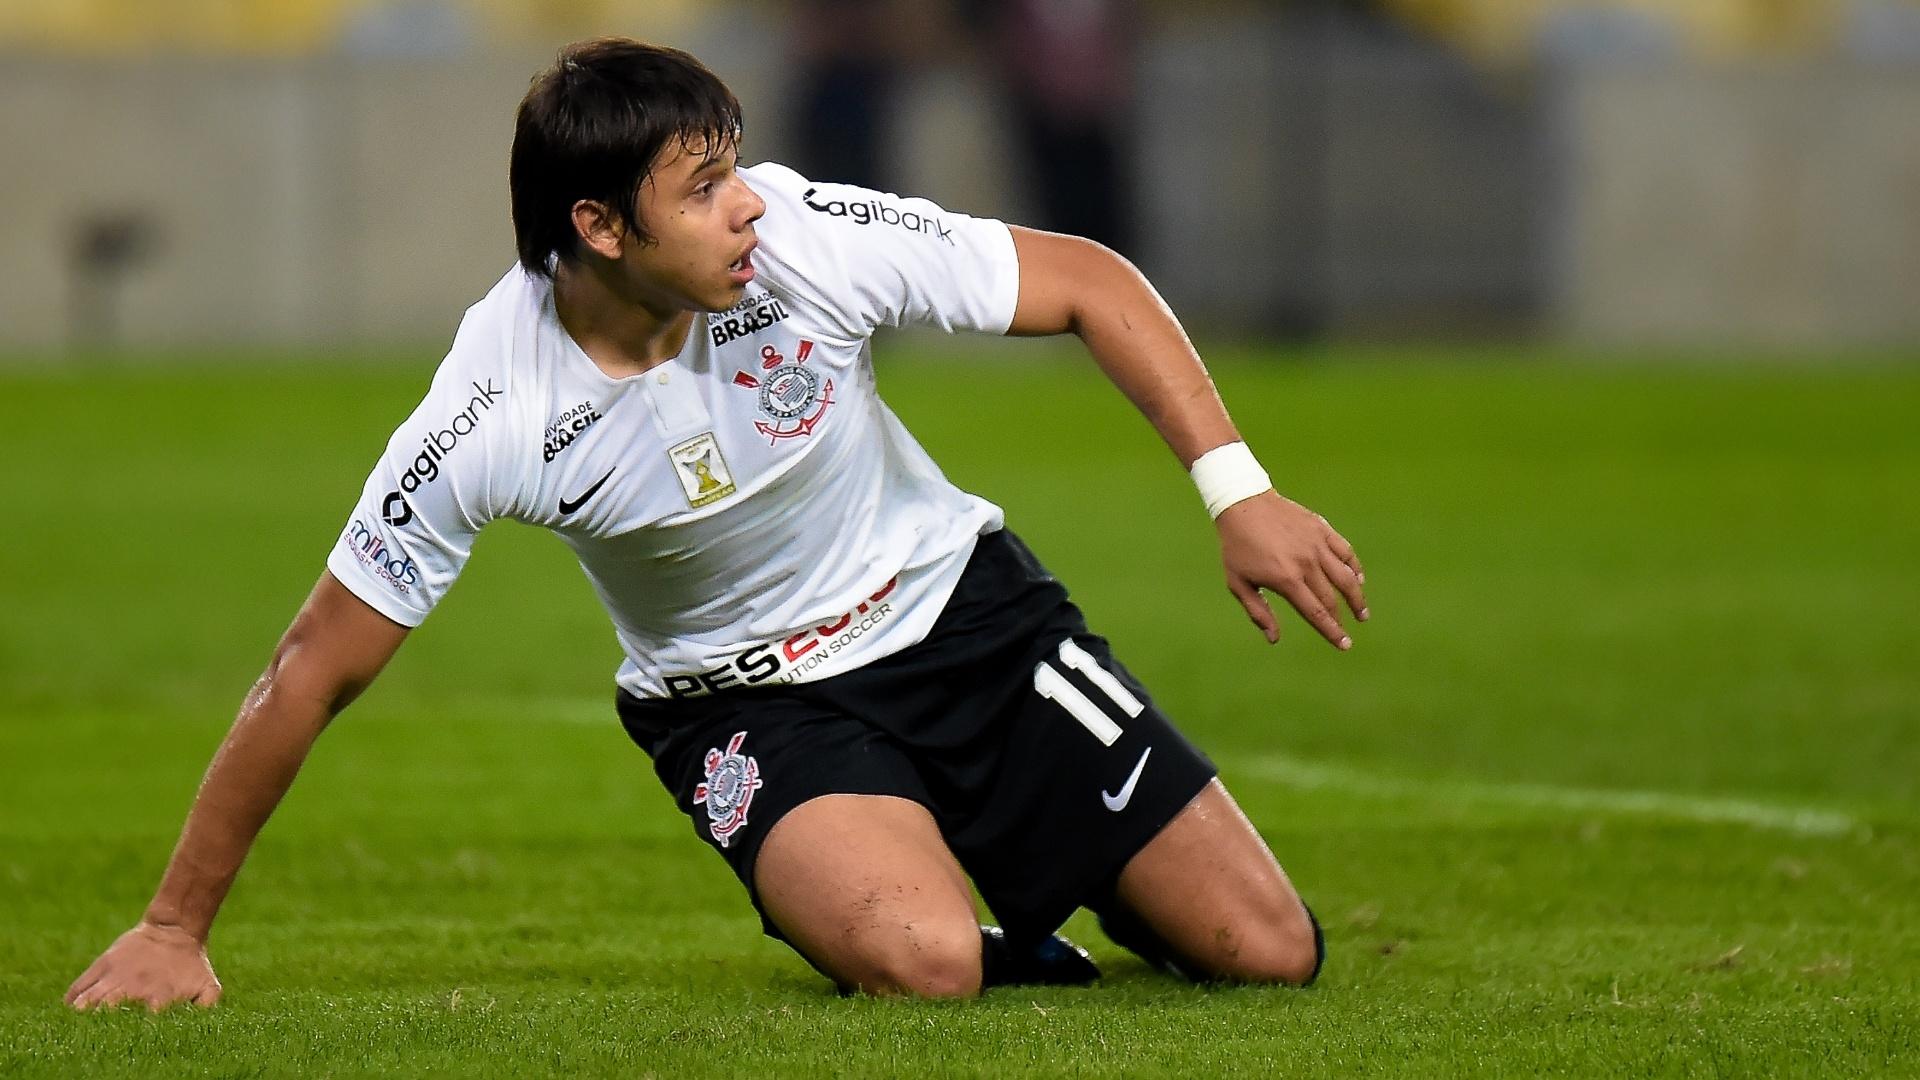 Romero lamenta chance perdida em jogo entre Fluminense e Corinthians